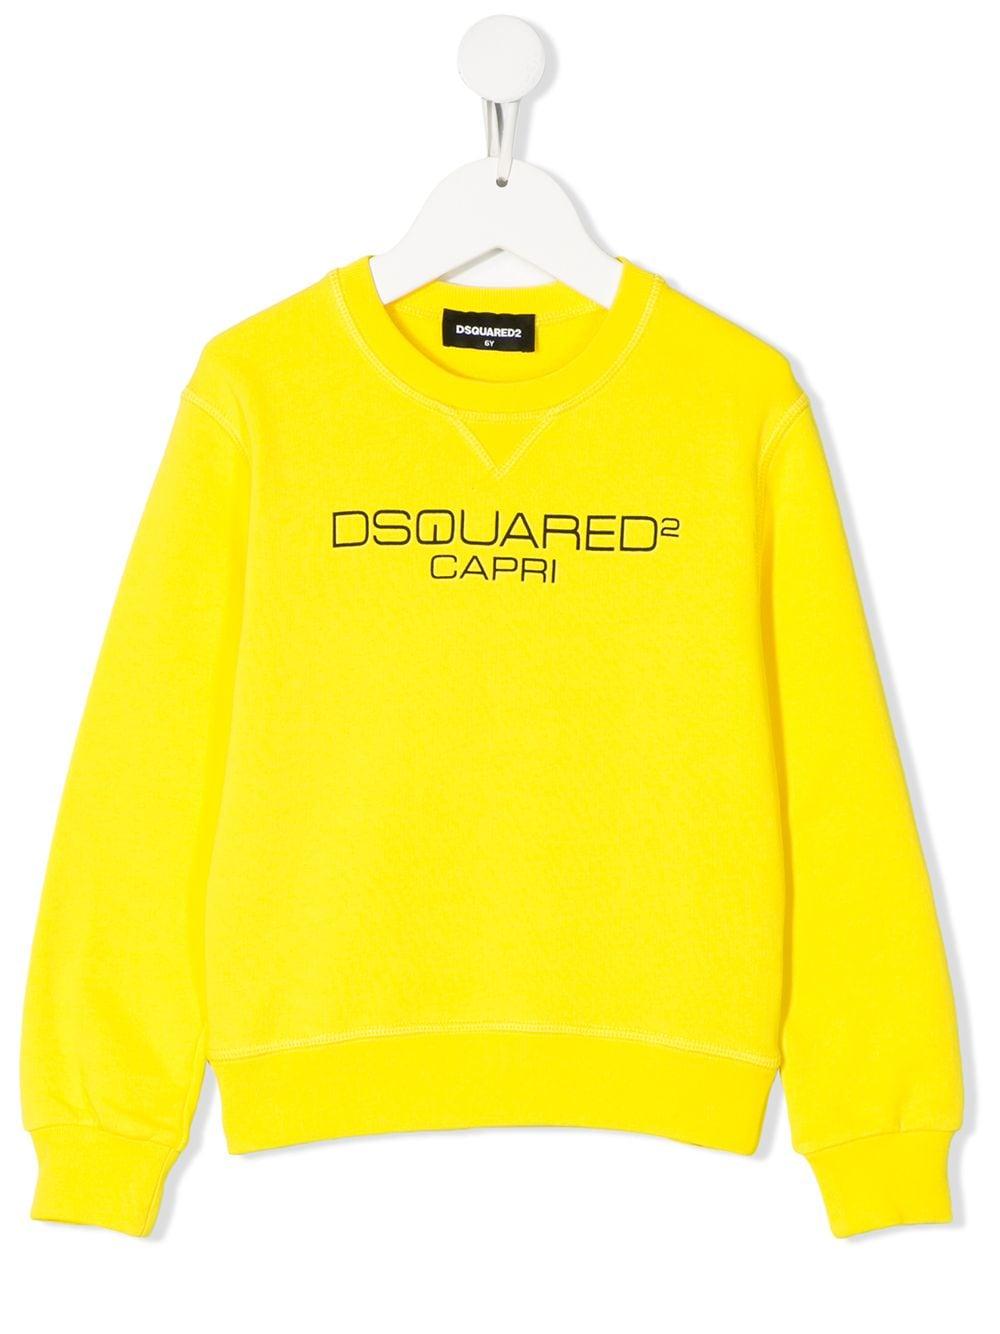 dsquared yellow sweatshirt